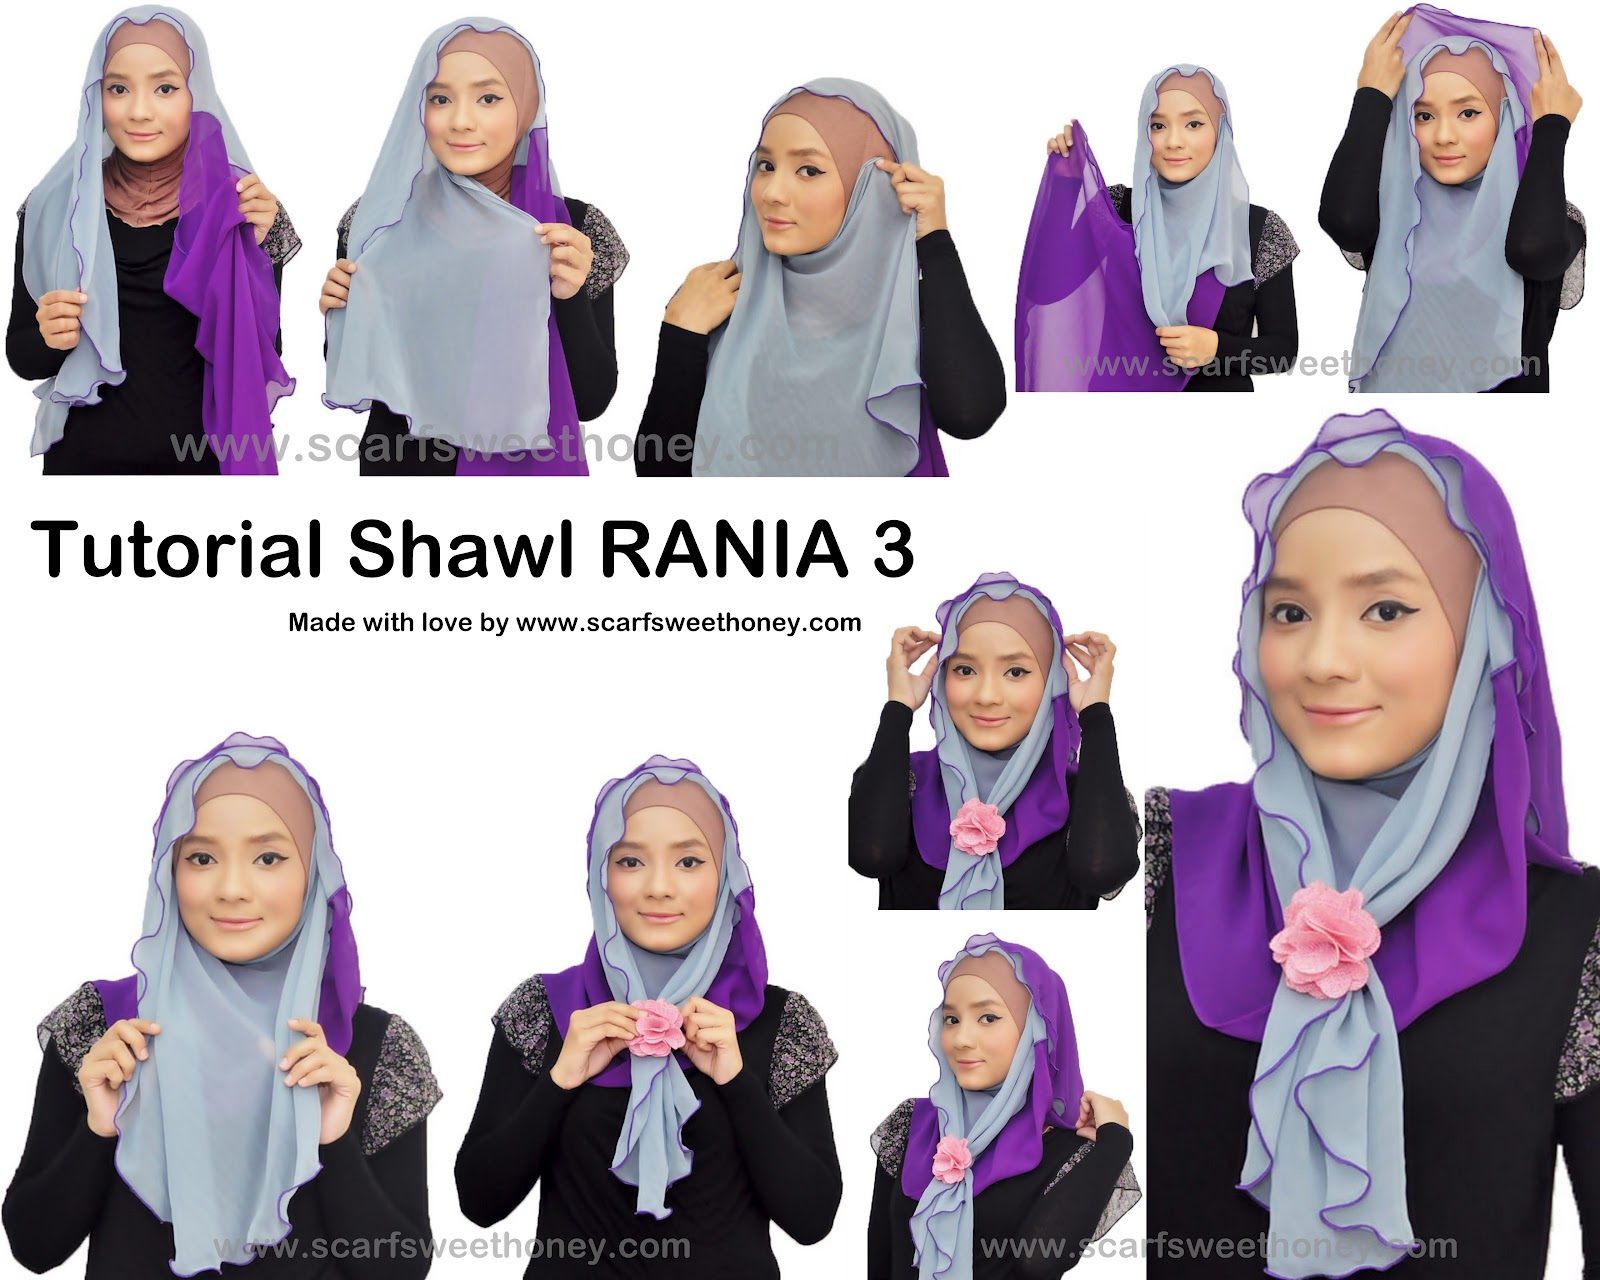 Cara Memakai Jilbab Shawl Rania 2 Tutorial Memakai Jilbab